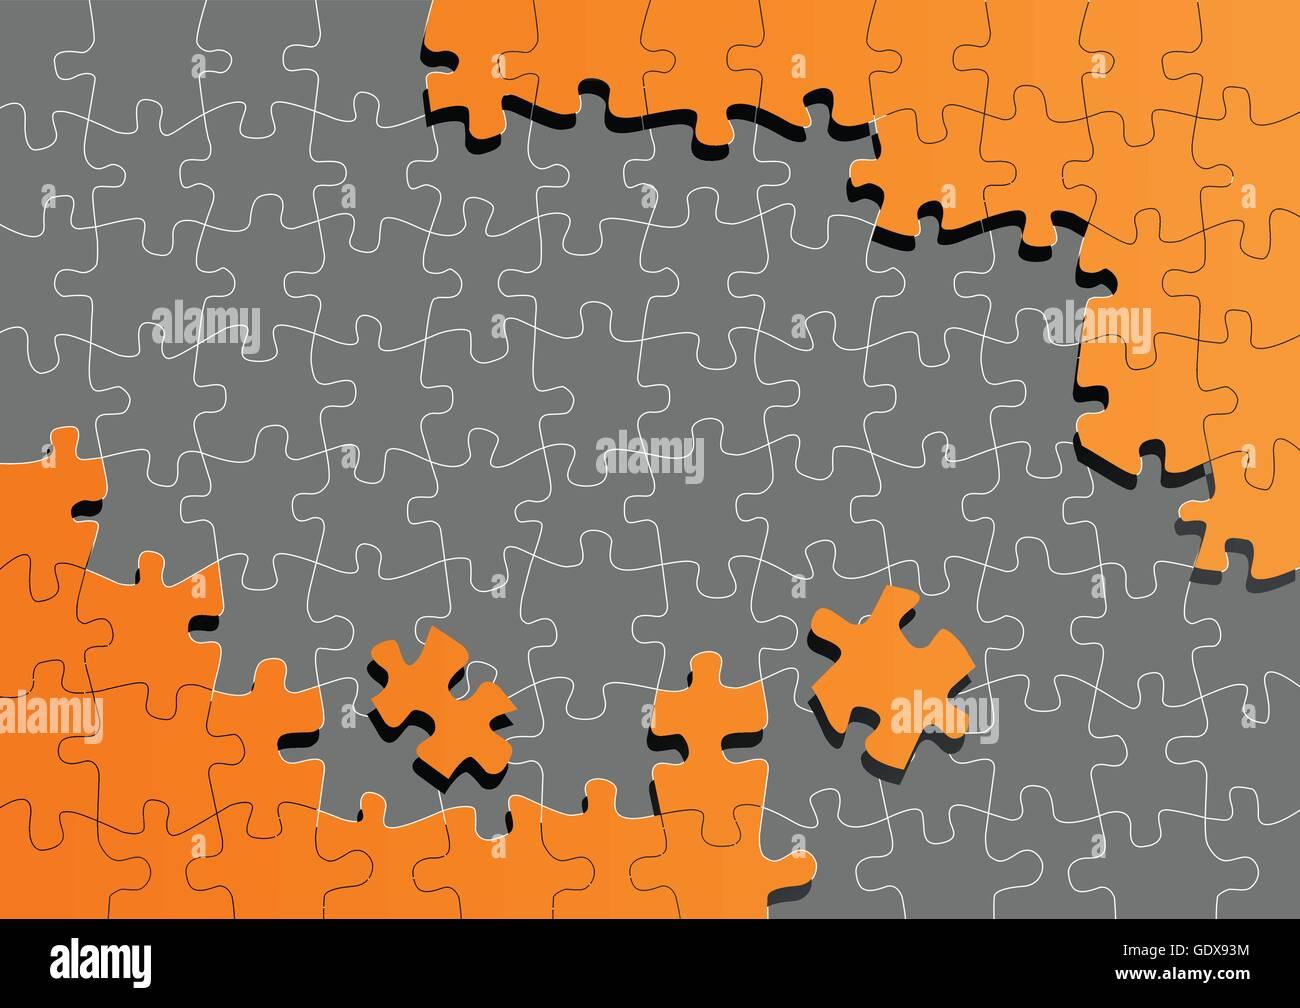 Orange Jigsaw Puzzle Vector Background Stock Photos & Orange Jigsaw ...